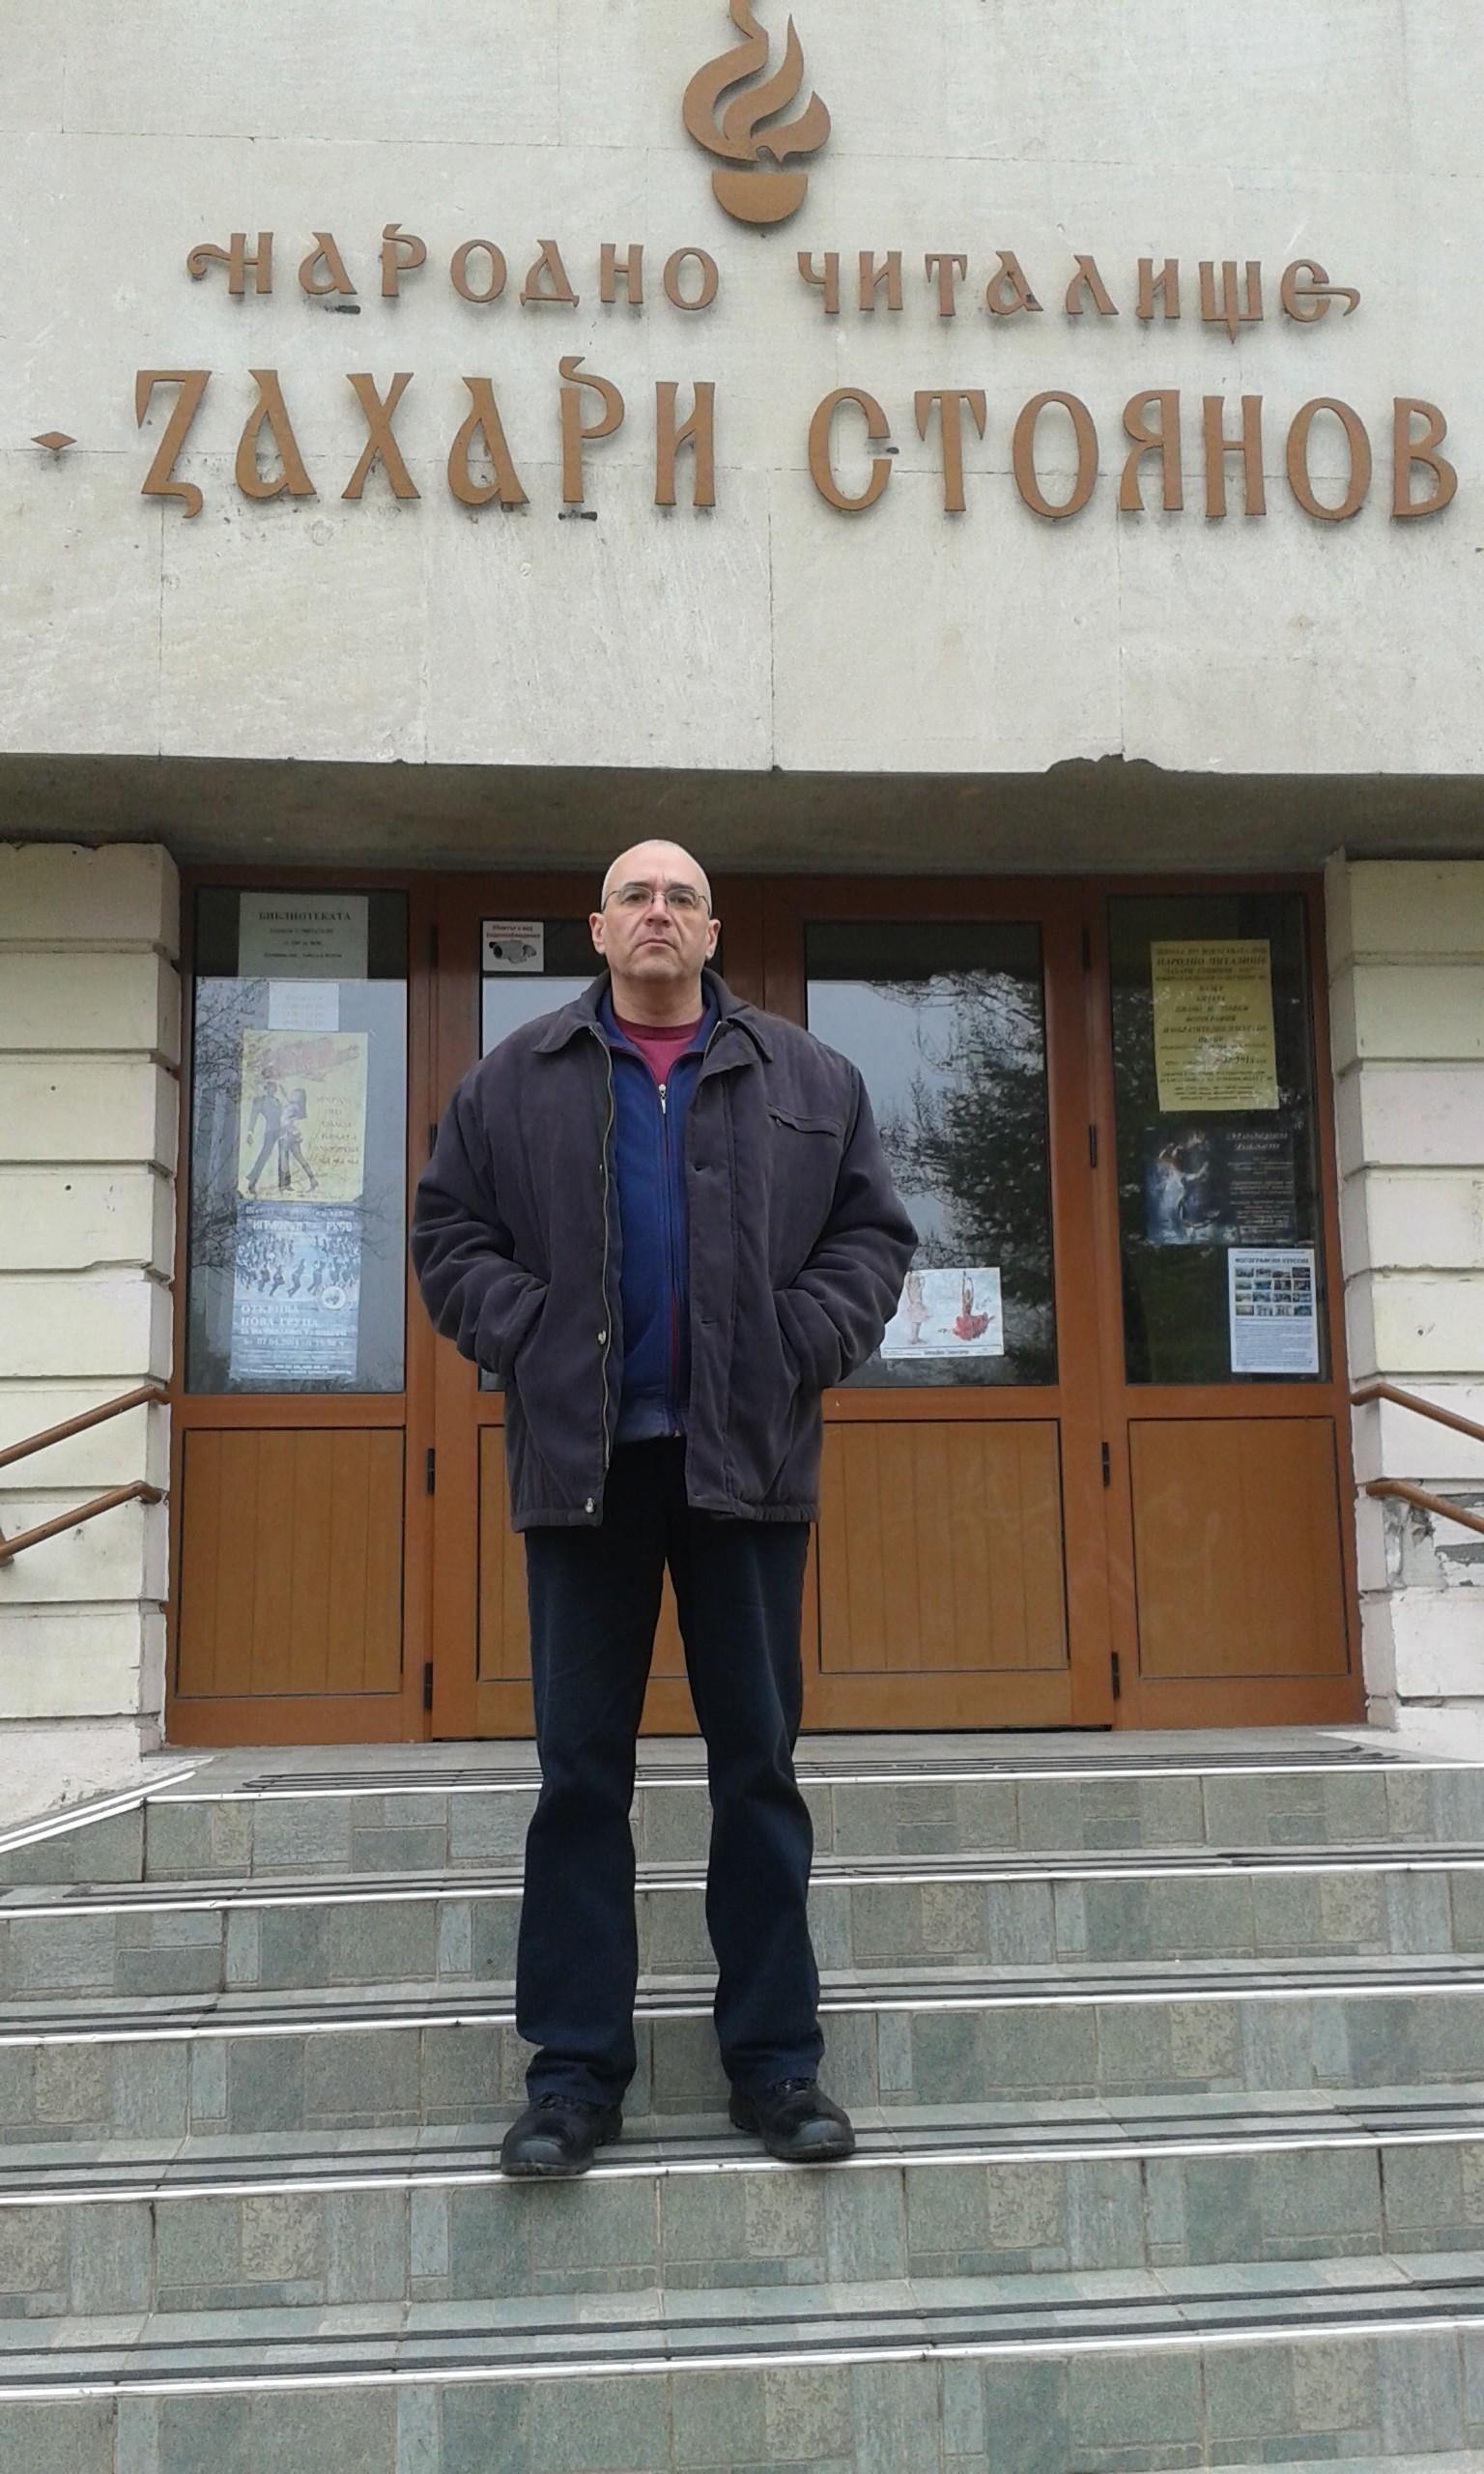 GOD SAVE BULGARIA Rosen Markov's SciFi novel was published on izdavam.com